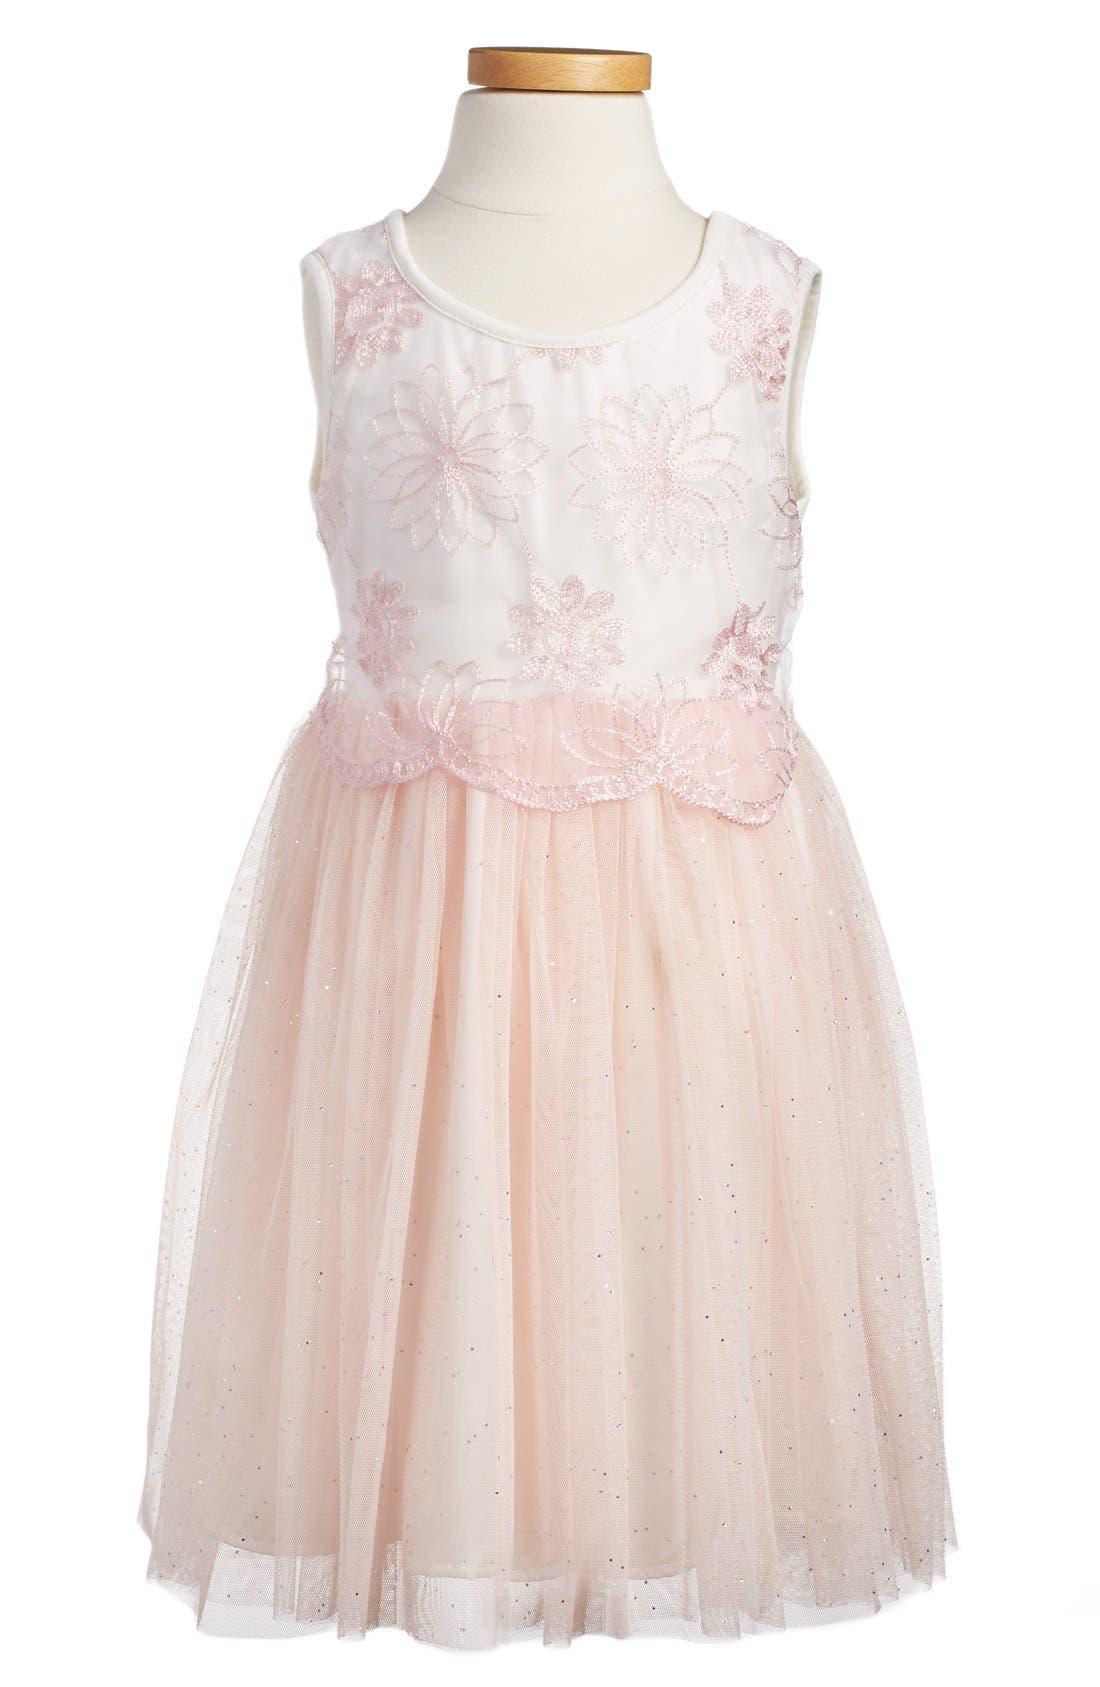 Alternate Image 1 Selected - Popatu Embroidered Tulle Dress (Toddler Girls, Little Girls & Big Girls)